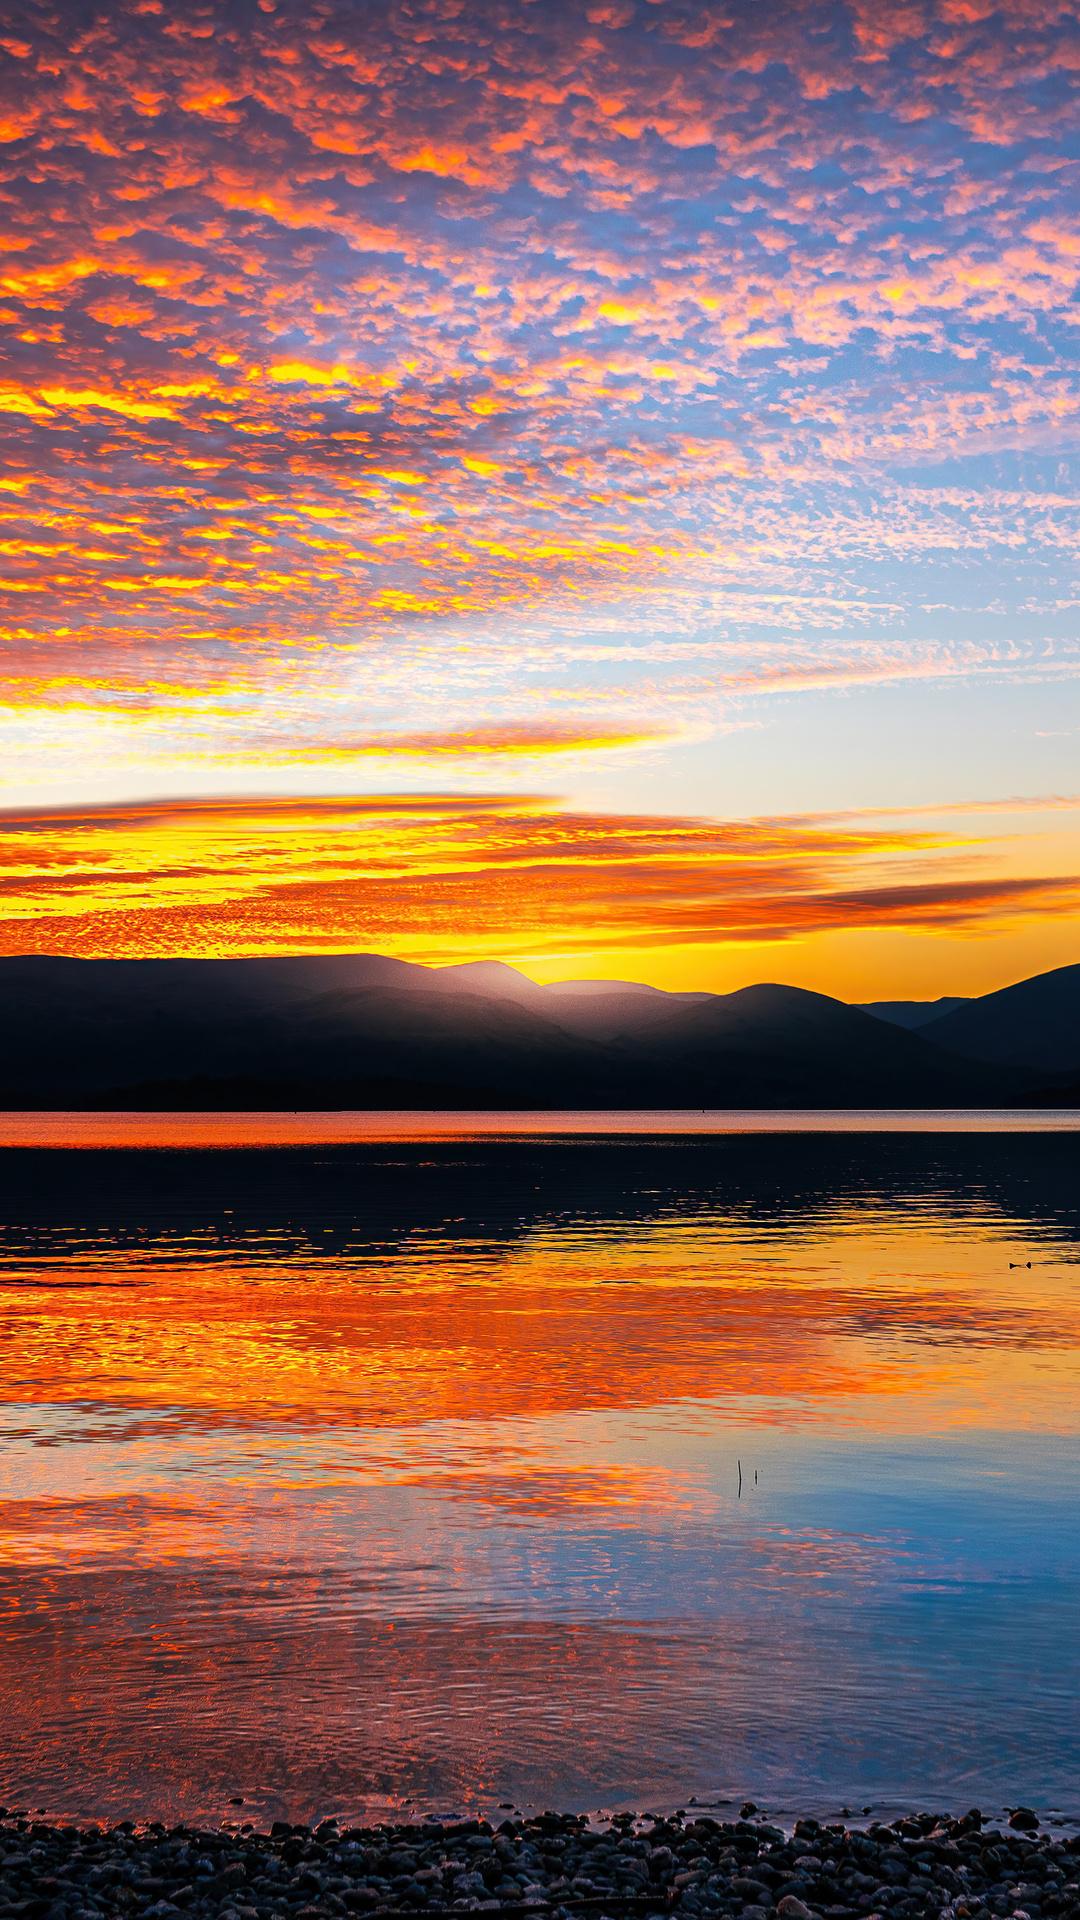 loch-lomond-sunset-scotland-5k-mm.jpg